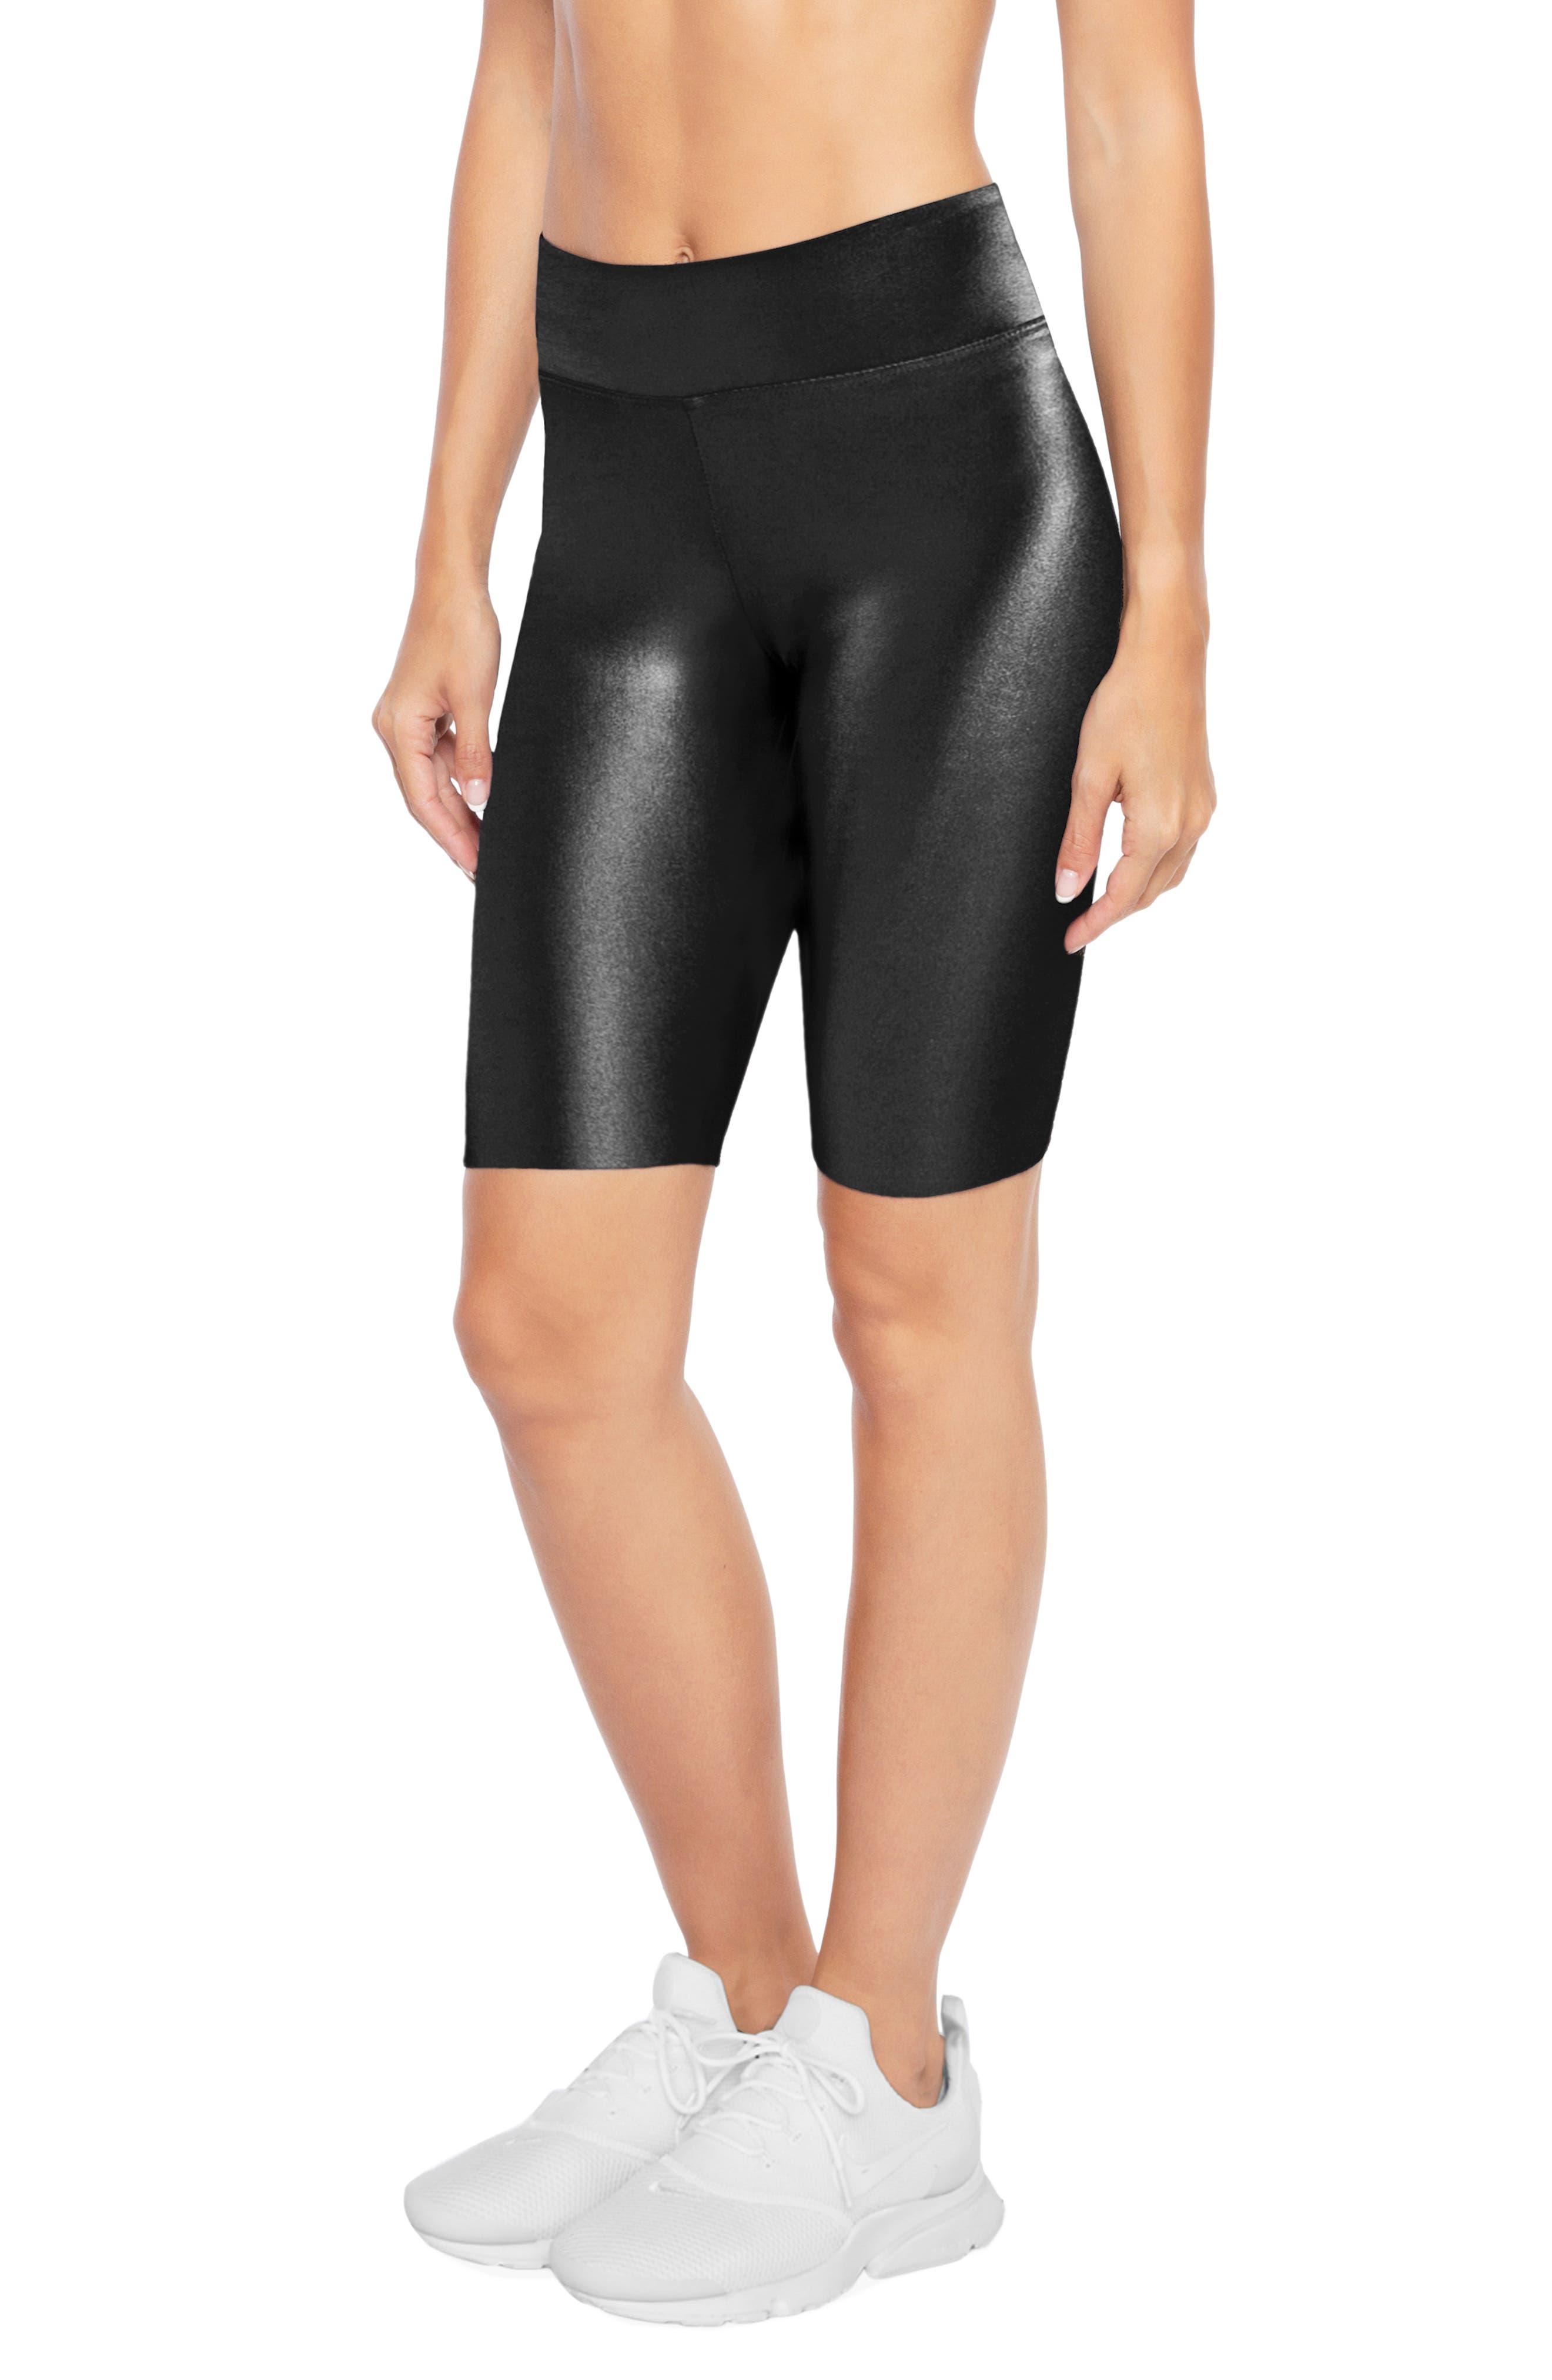 Densonic High Waist Bike Shorts,                             Alternate thumbnail 3, color,                             BLACK